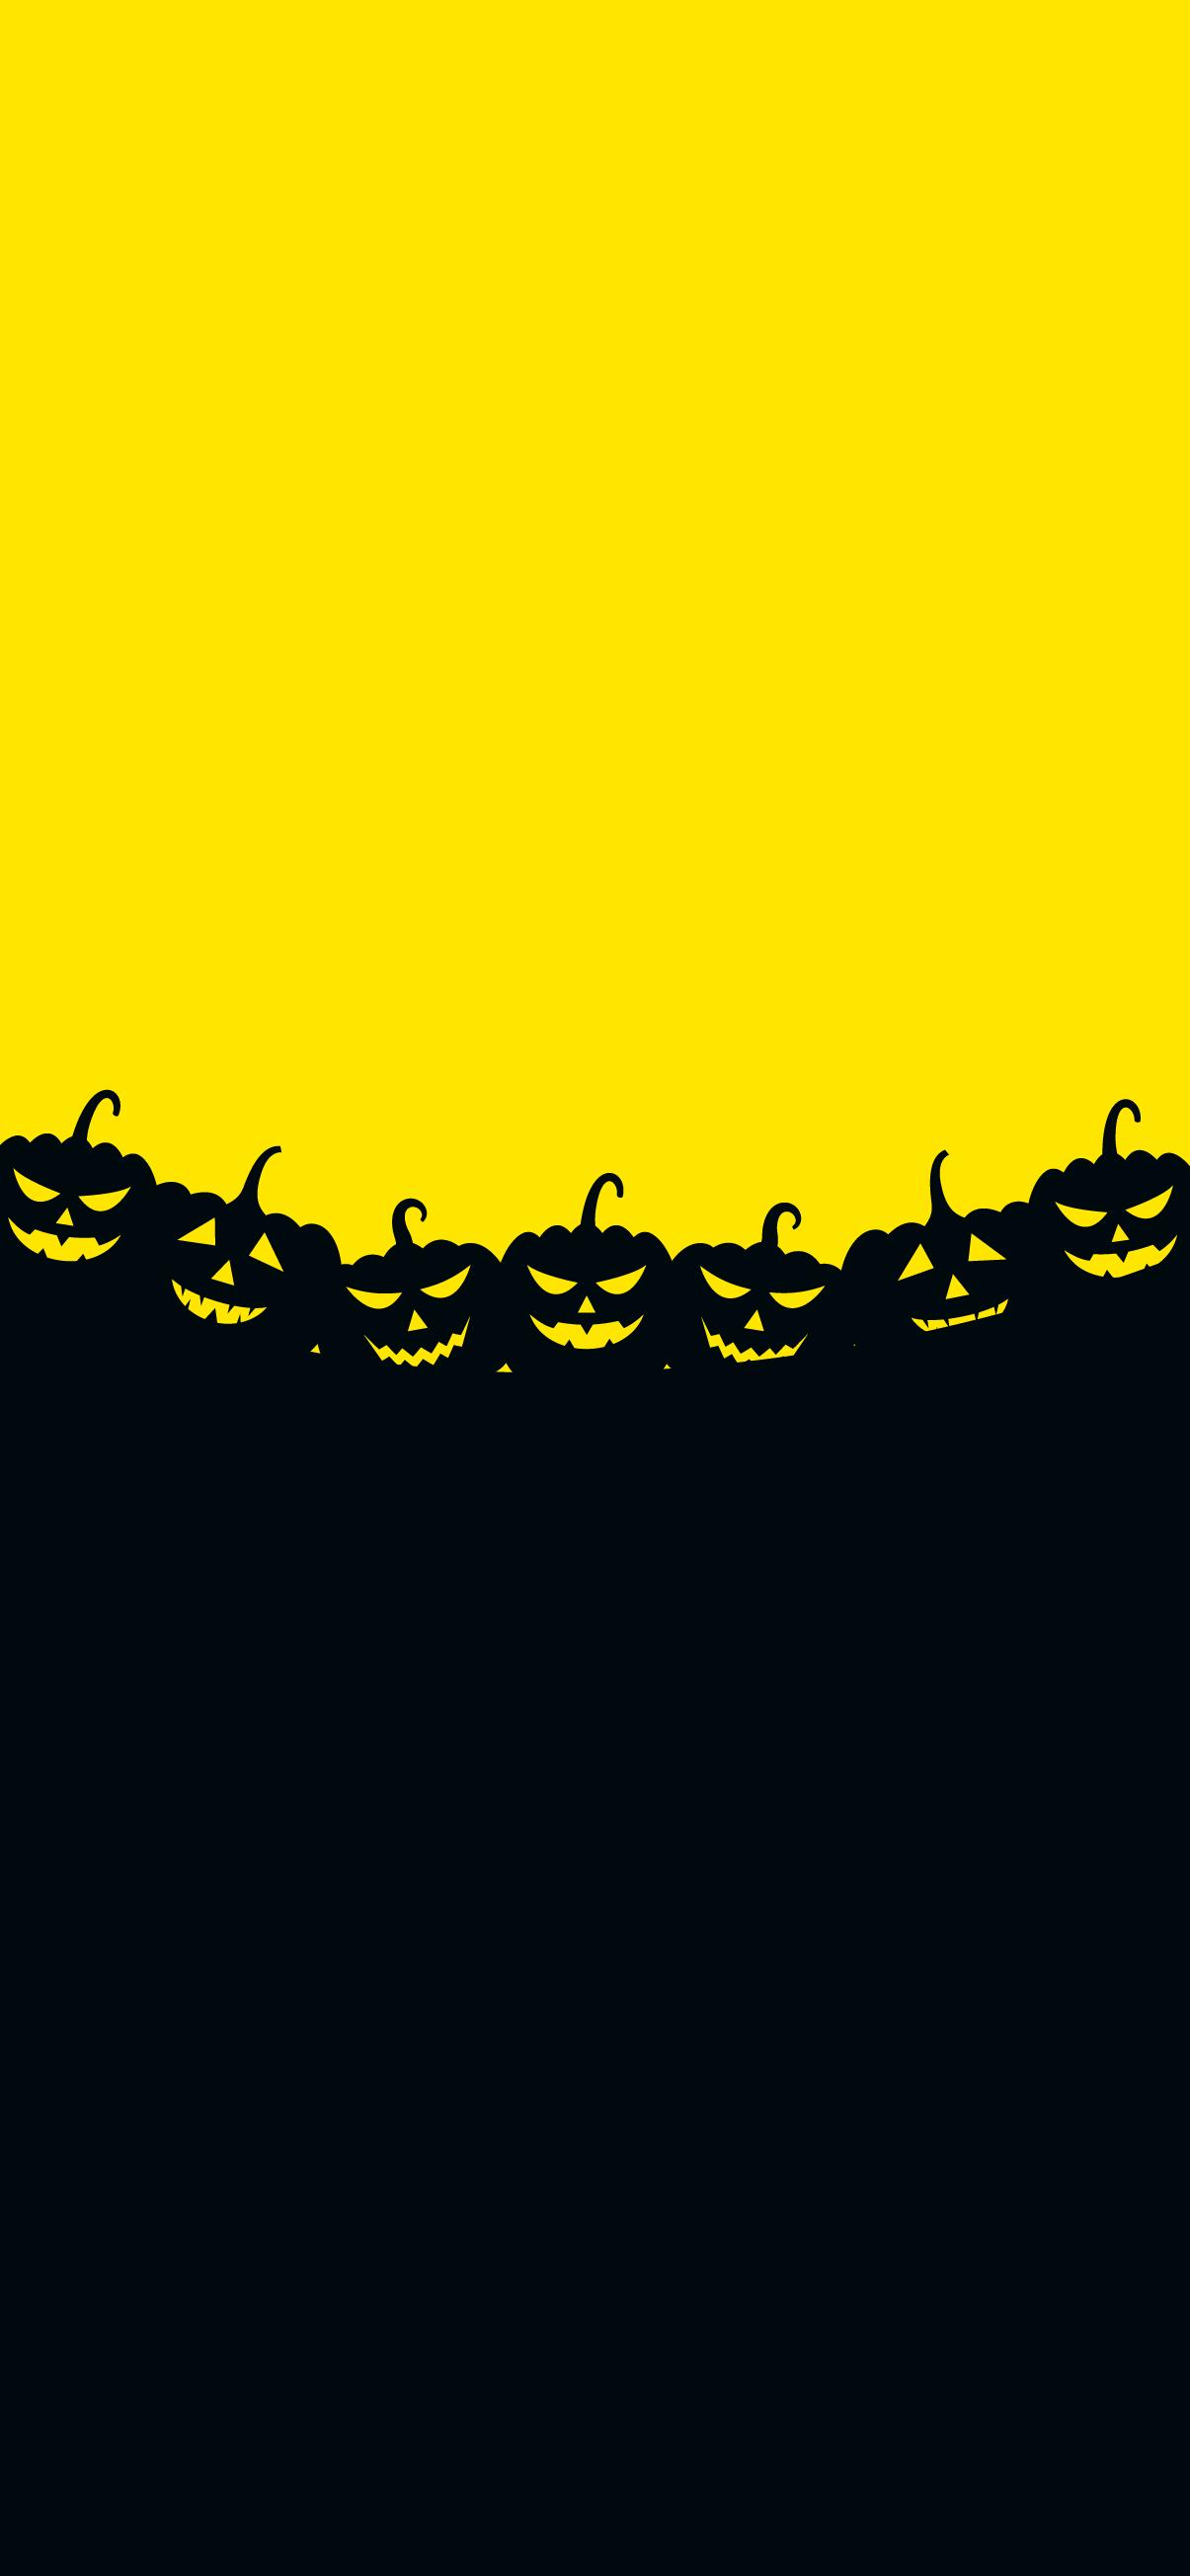 happy halloween 2020 background wallpaper lockscreen amoled